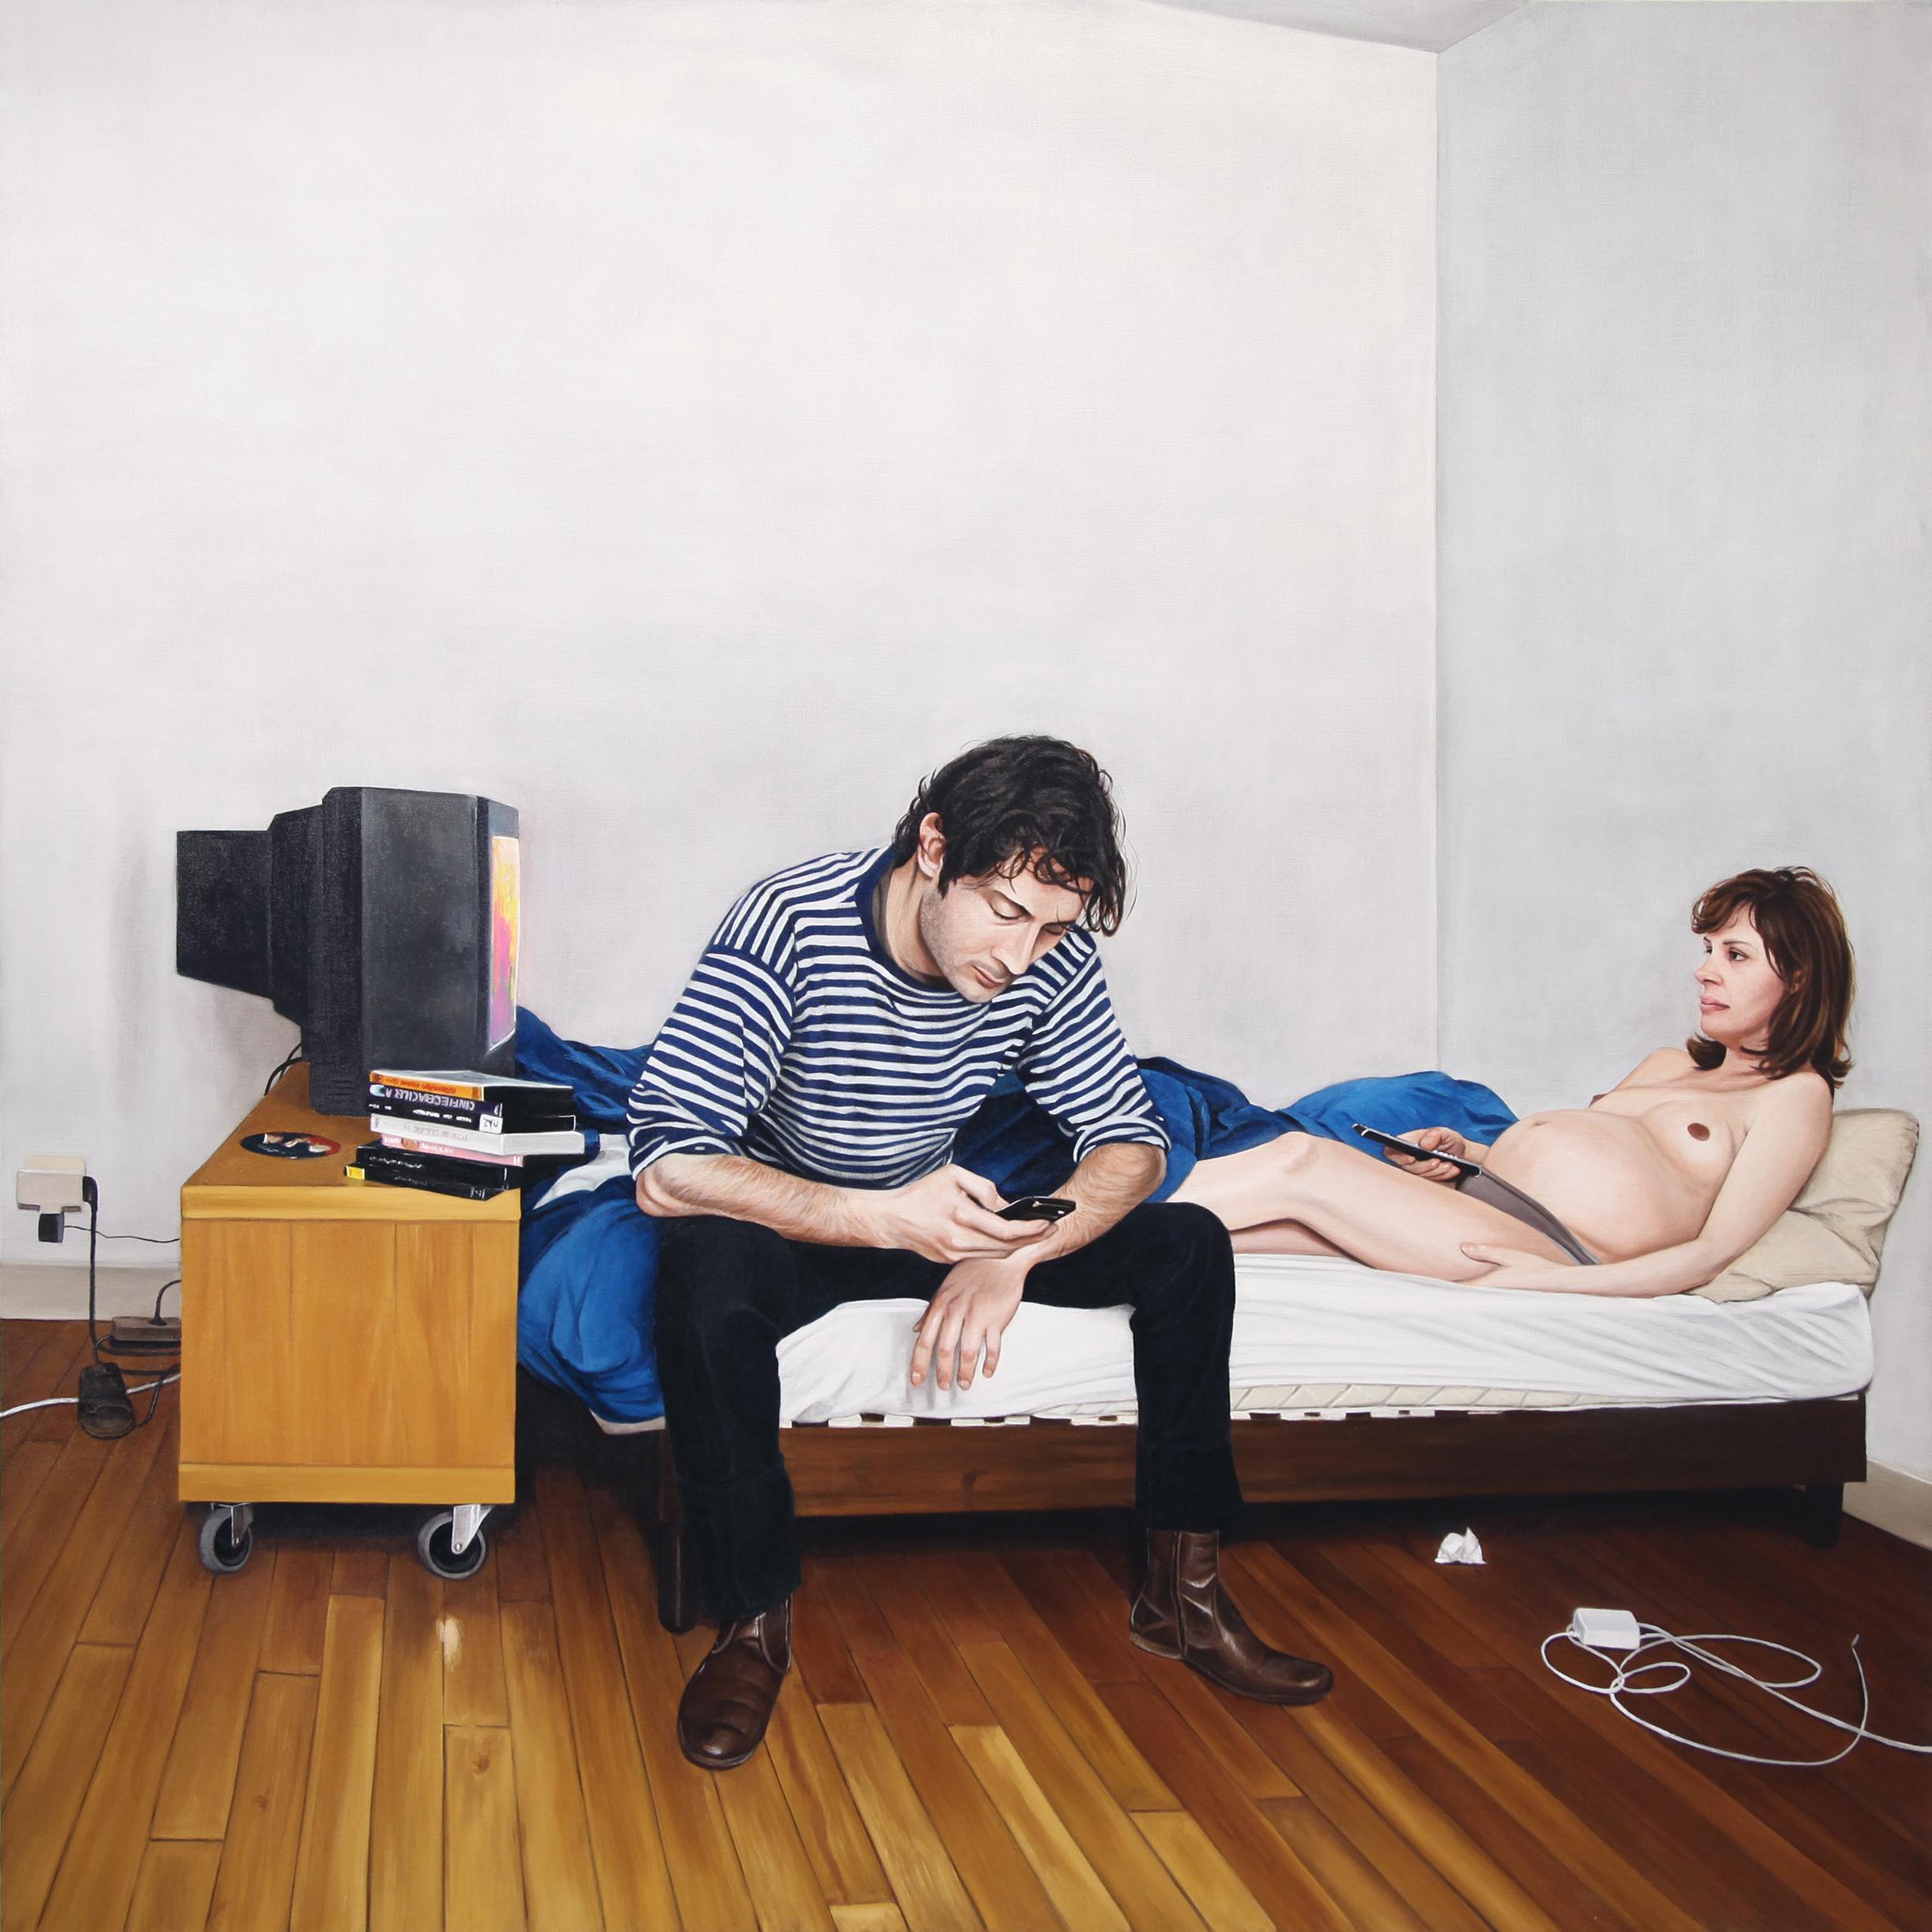 Thomas Lévy-Lasne, la peinture maintenant